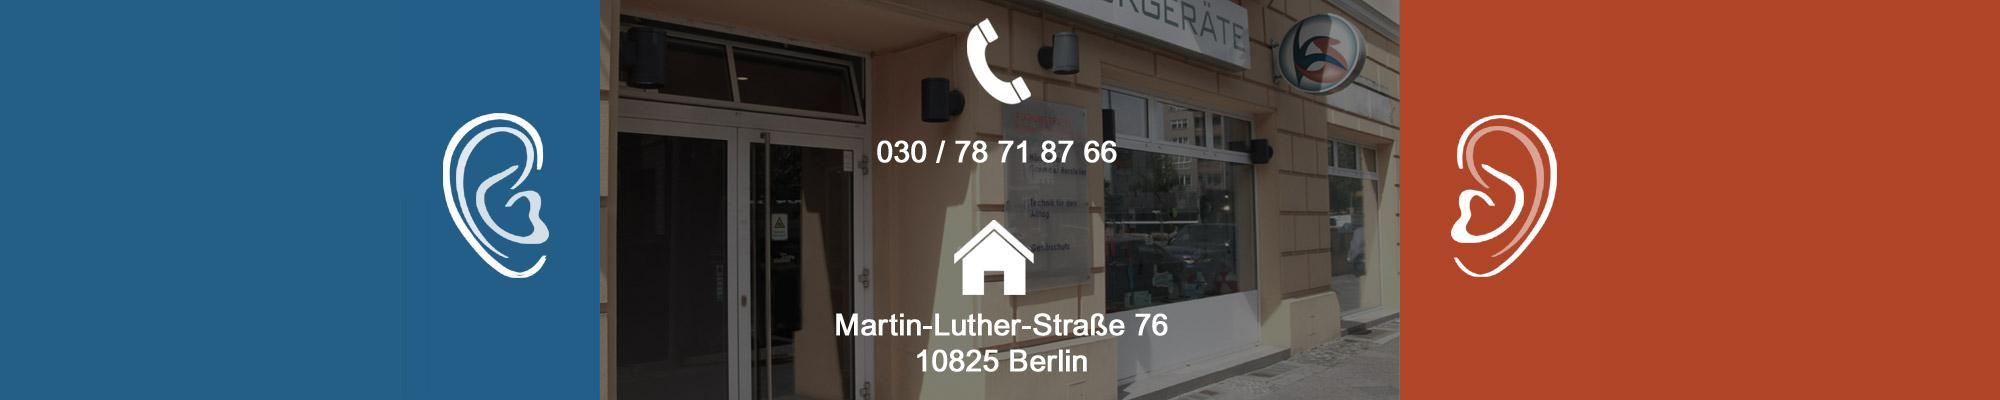 Adresse und Telefonnummer der KS-Hörgeräte Berlin